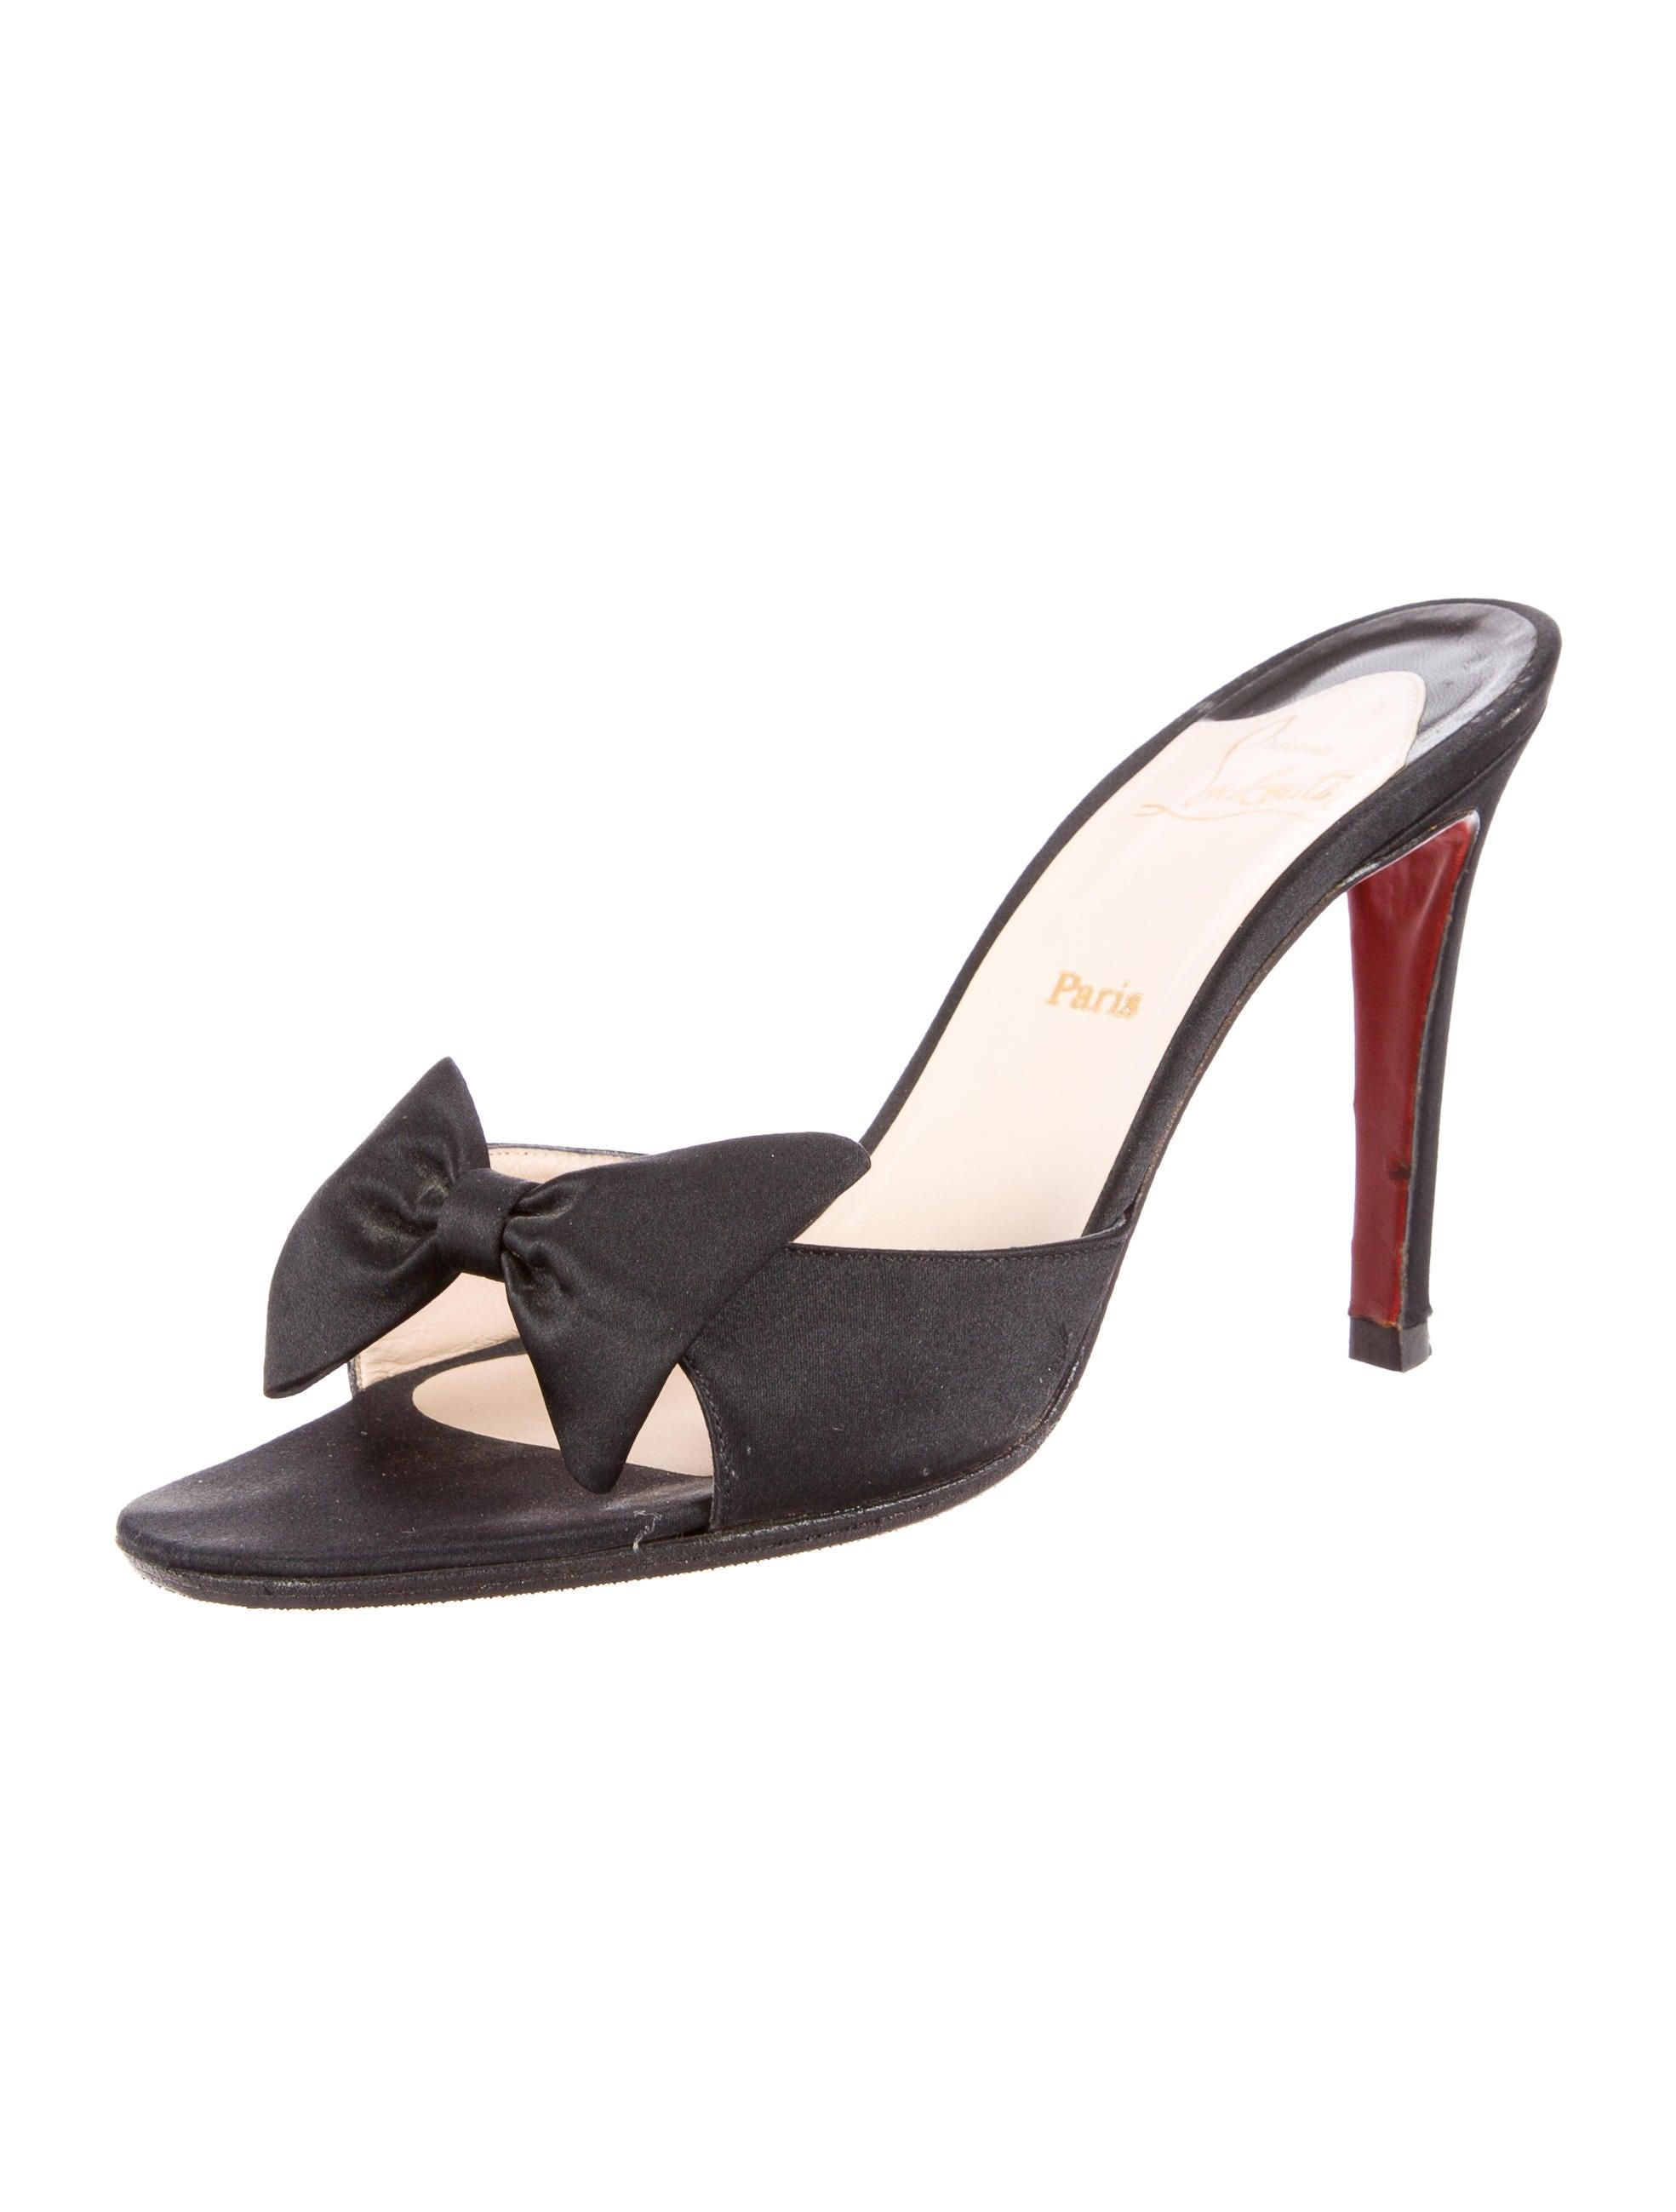 650c61c4cba4 Christian Louboutin Grey Shoes Jobs Animal Print Pumps